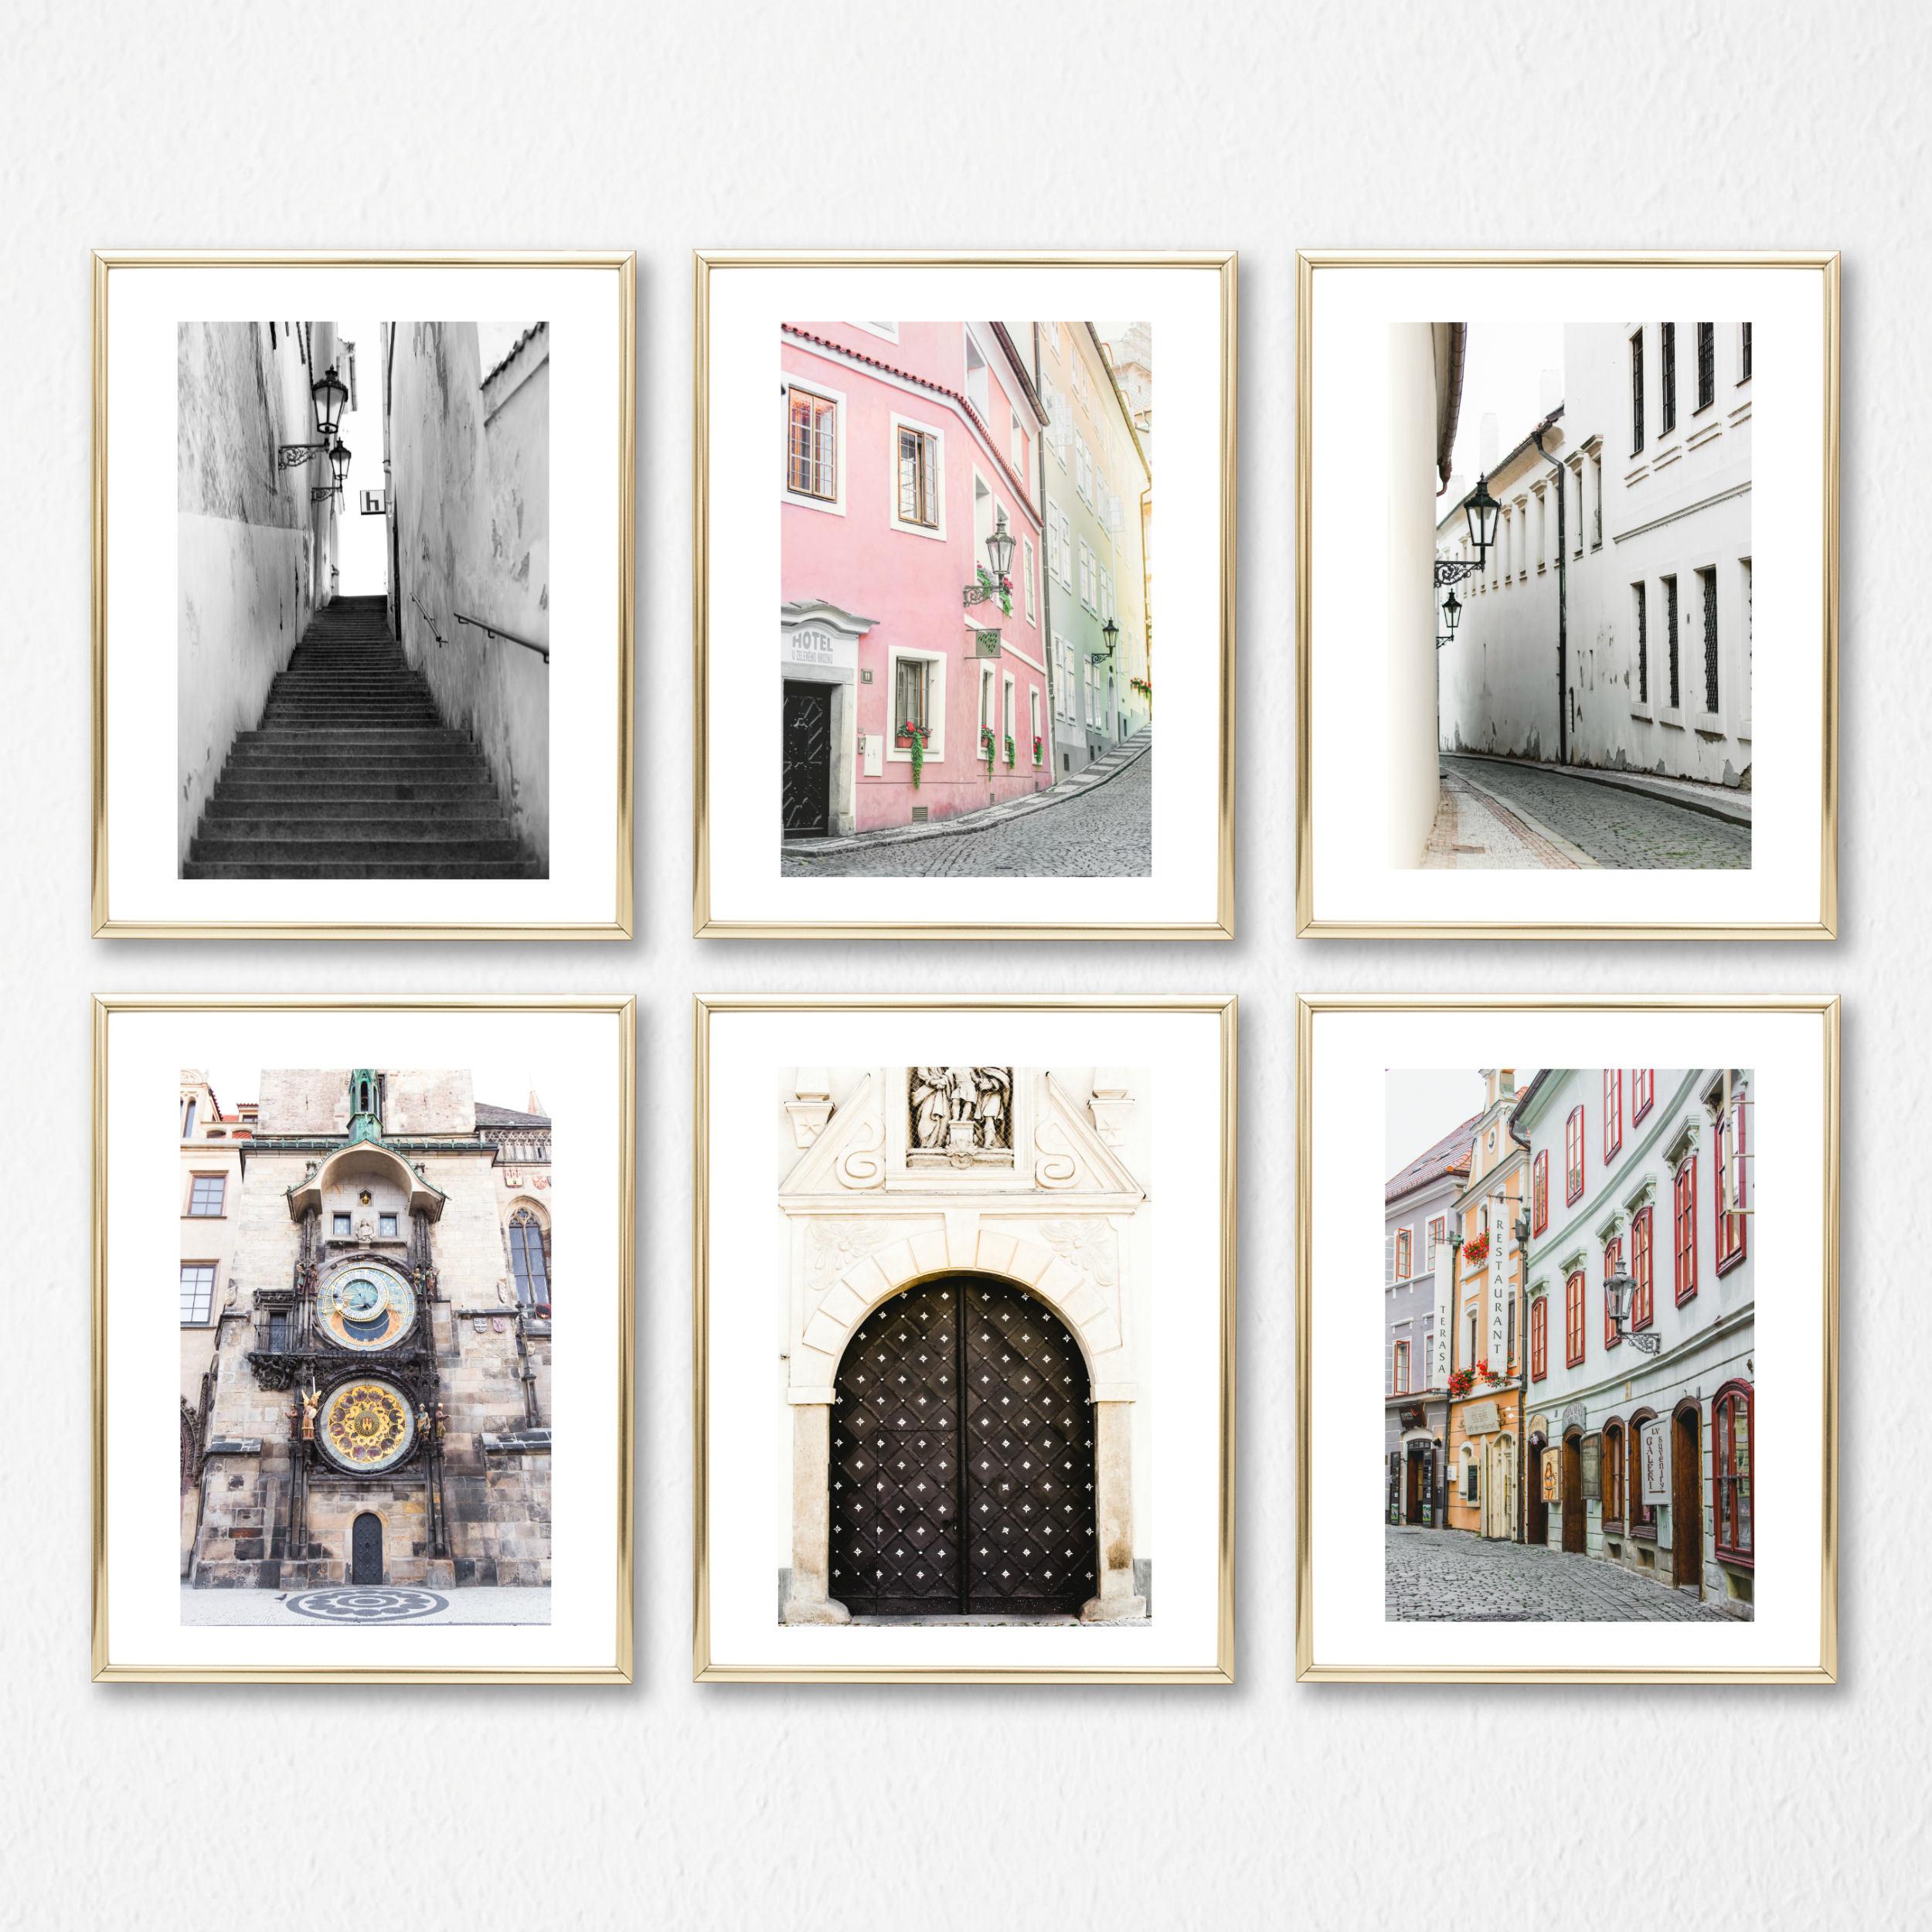 Gallery Wall Set room decor prints set, blush decor art set of 6, prague prints